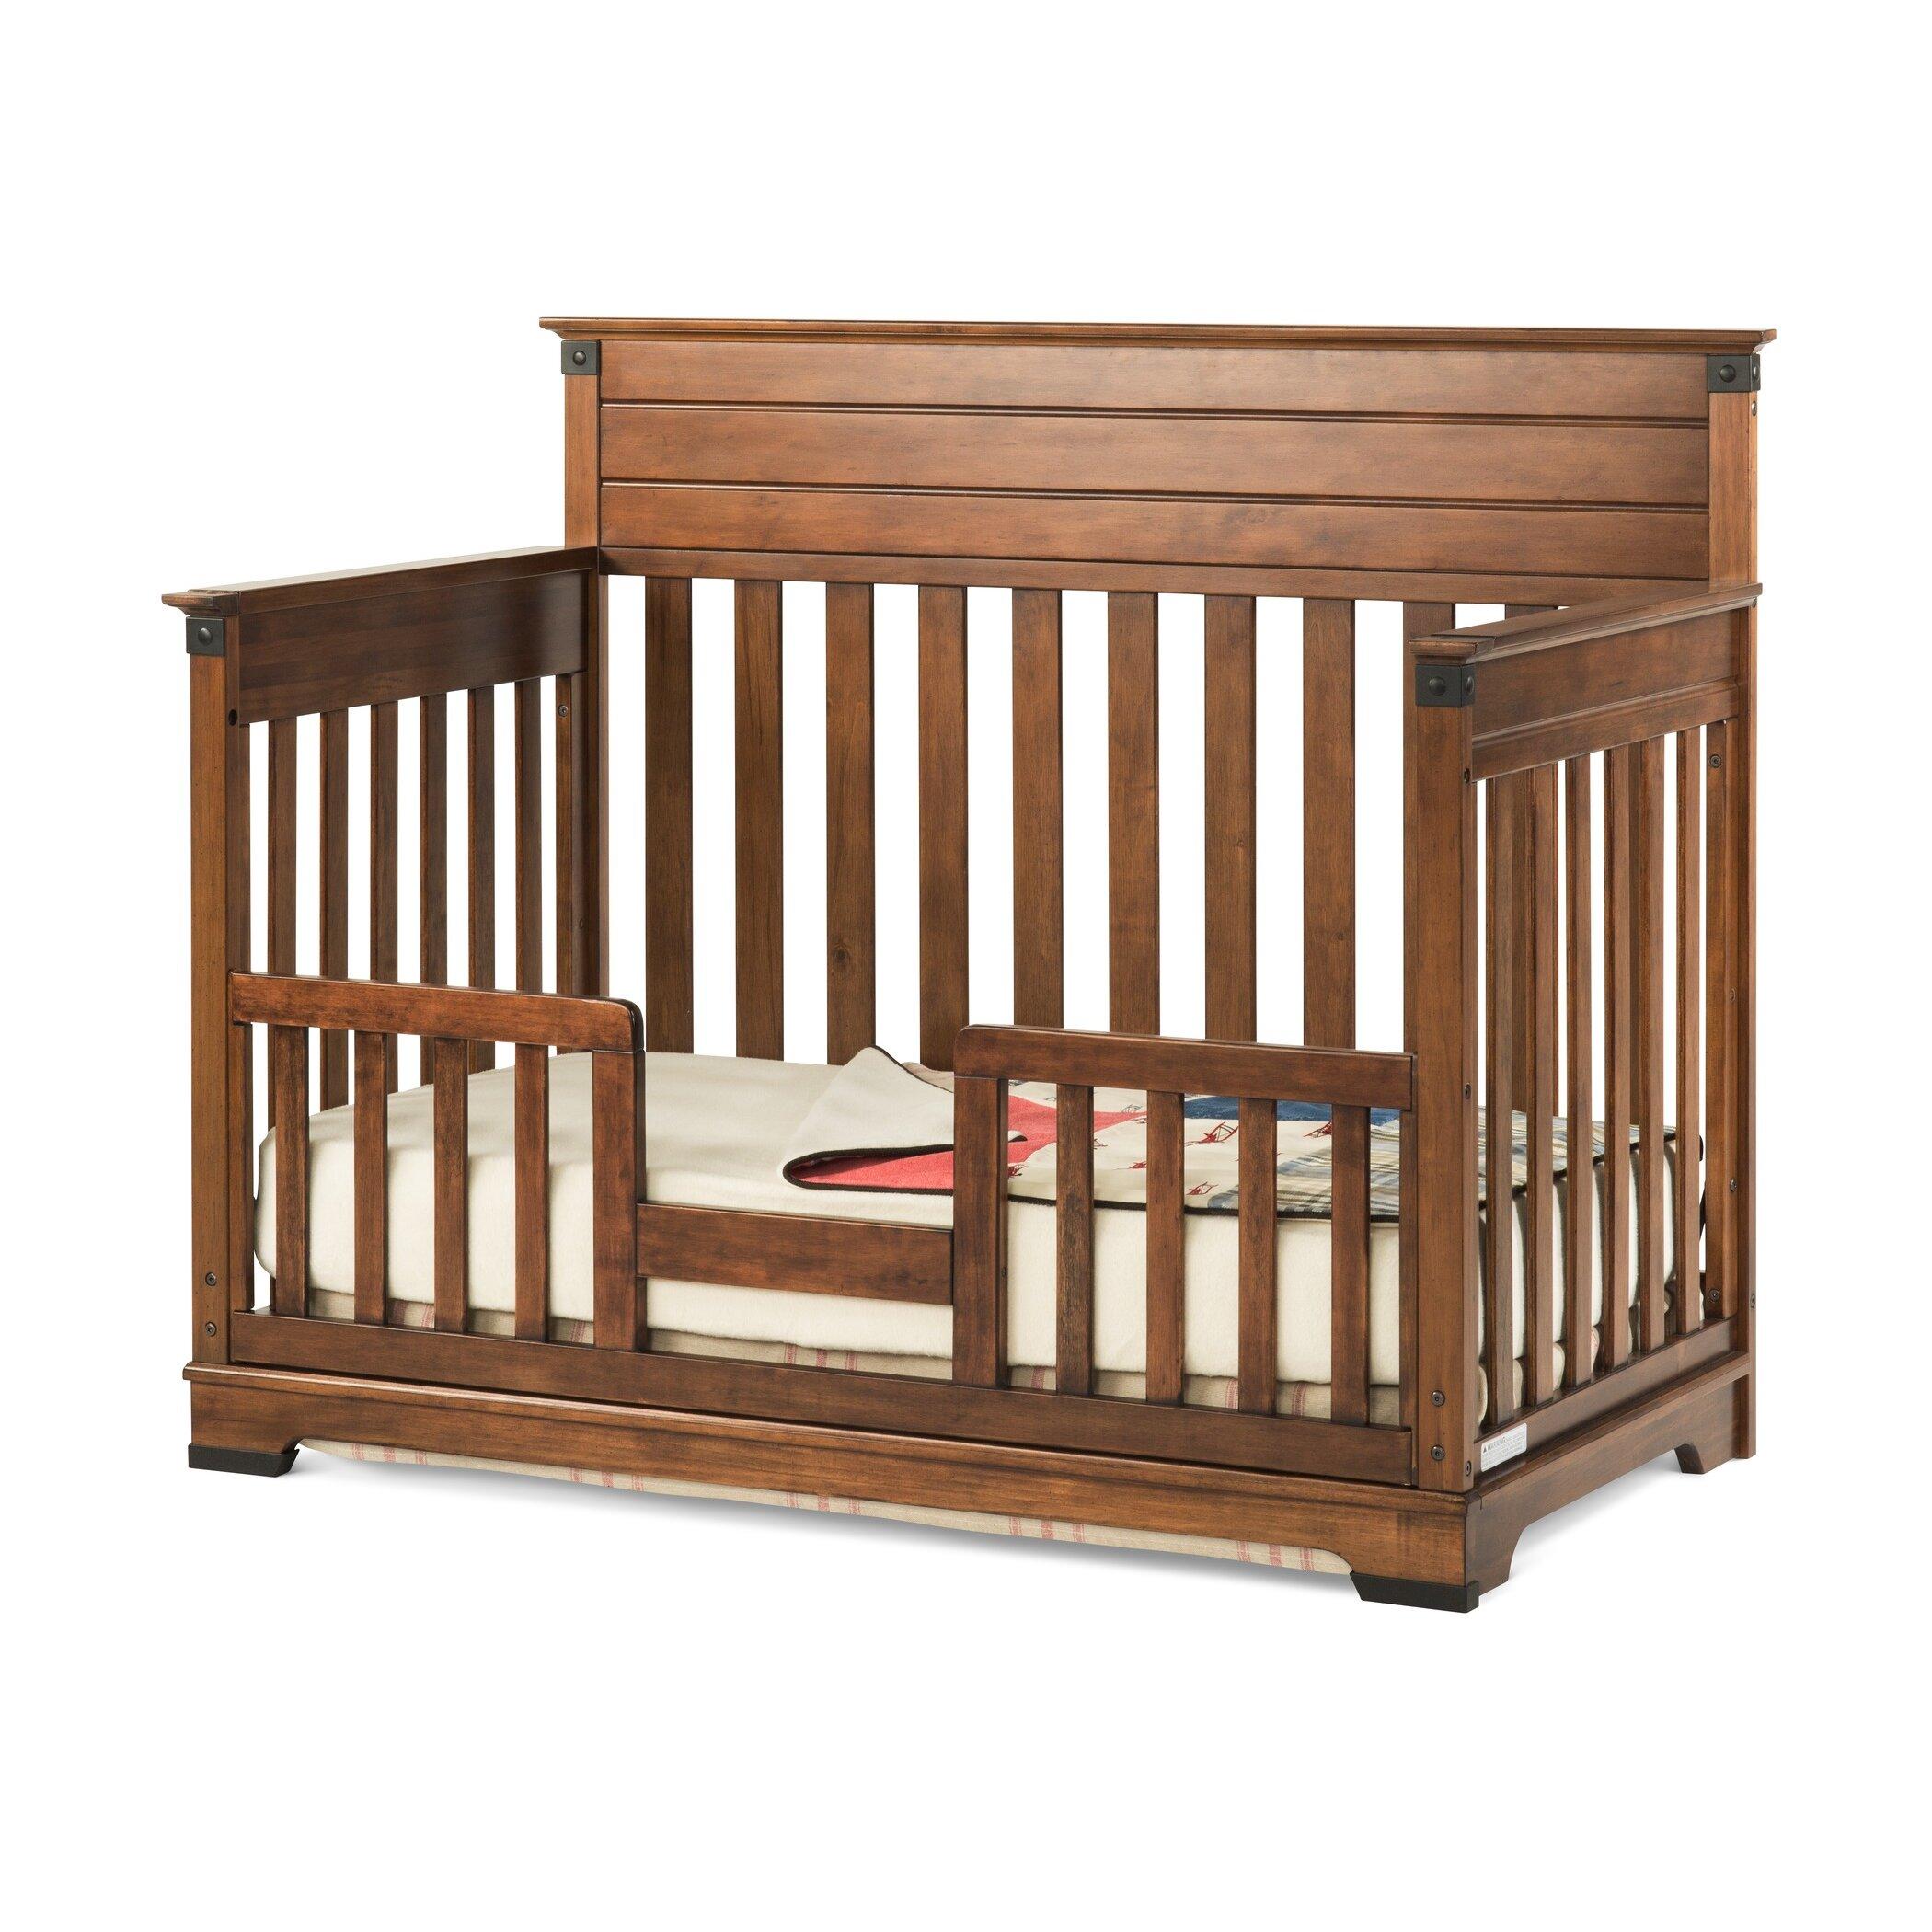 Baby bed furniture - Child Craft Redmond Convertible Crib